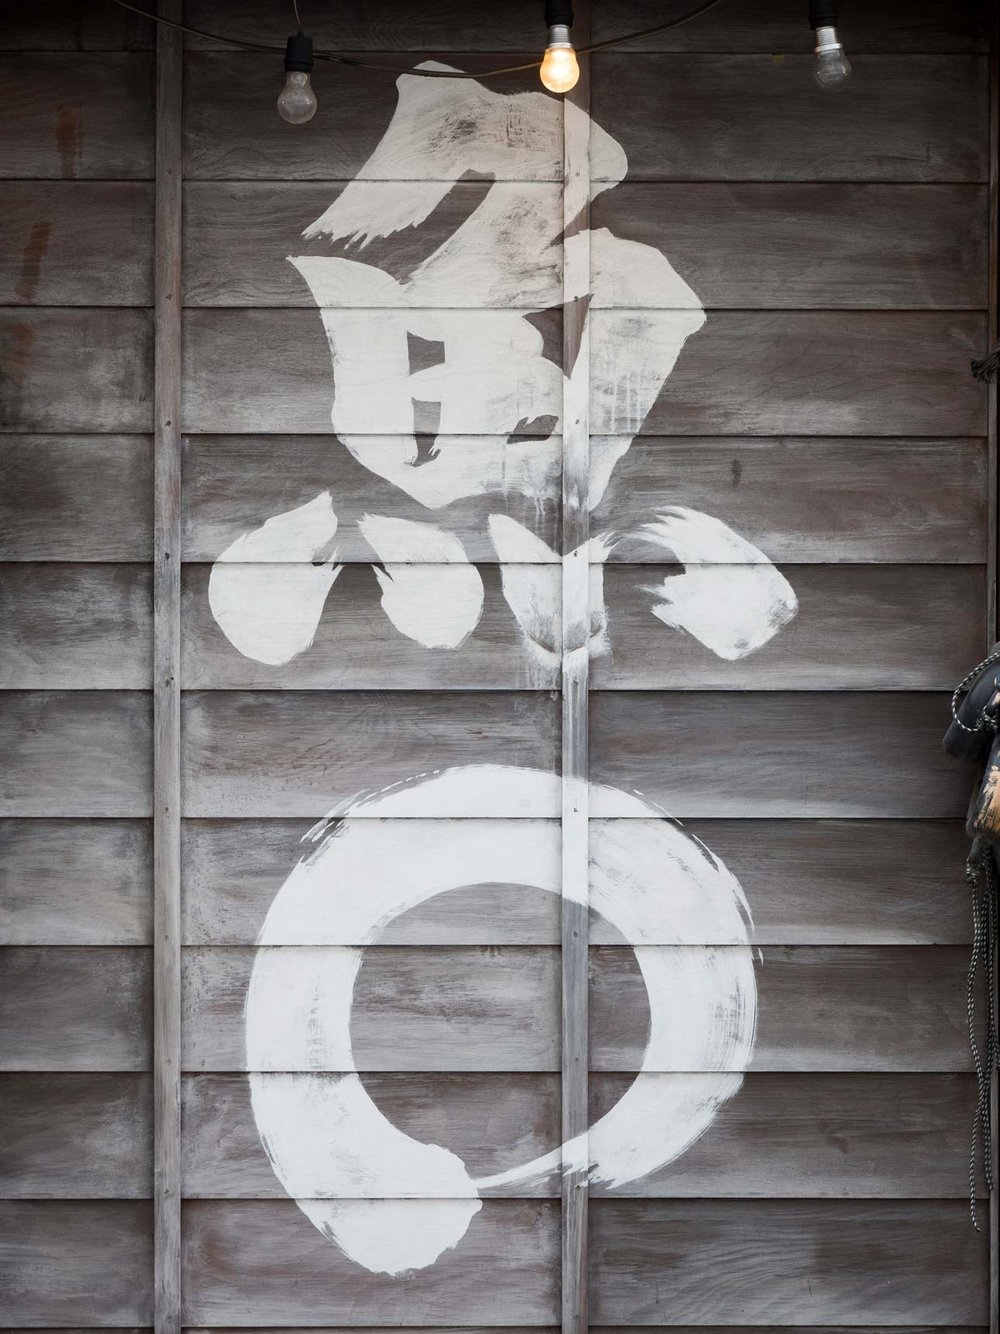 2017-09-03-jp-tokyo-ginza-signboard-06.jpg